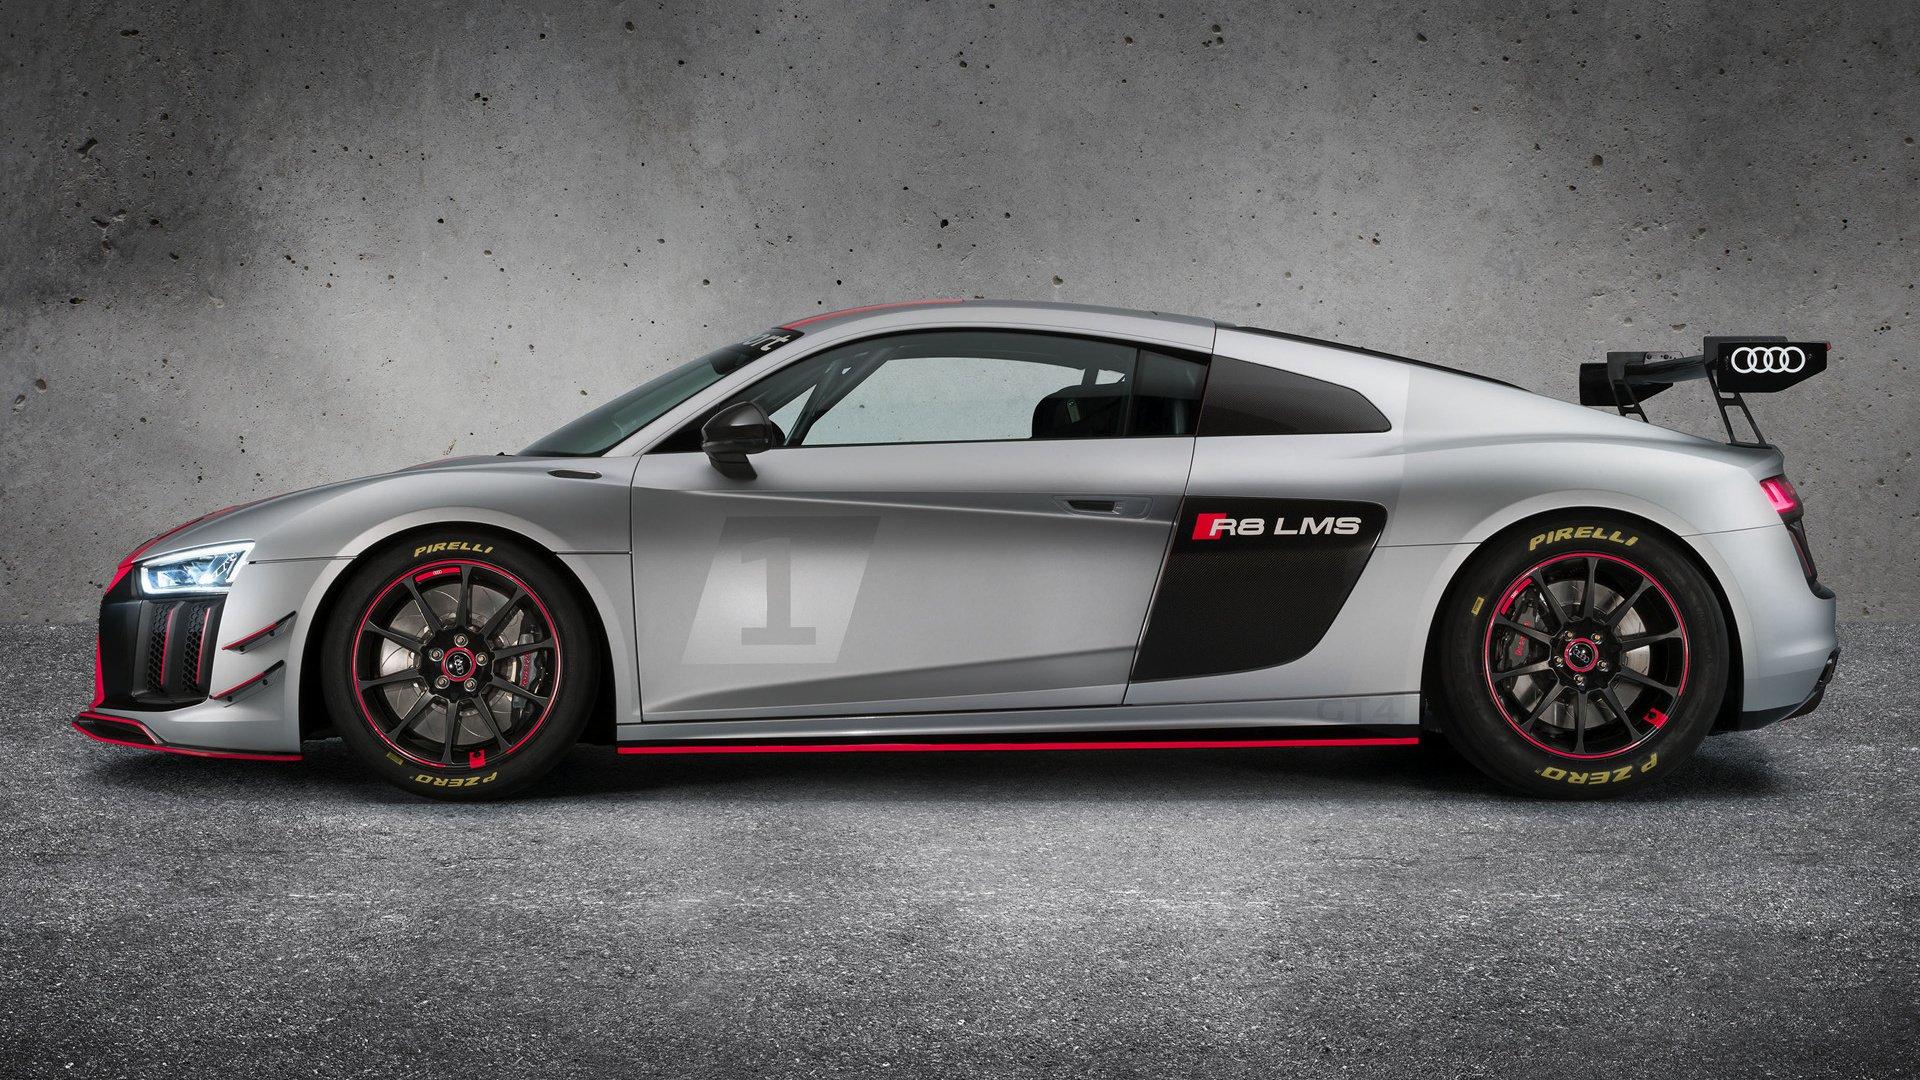 2017 Audi R8 Lms Gt4 Hd Wallpaper Background Image